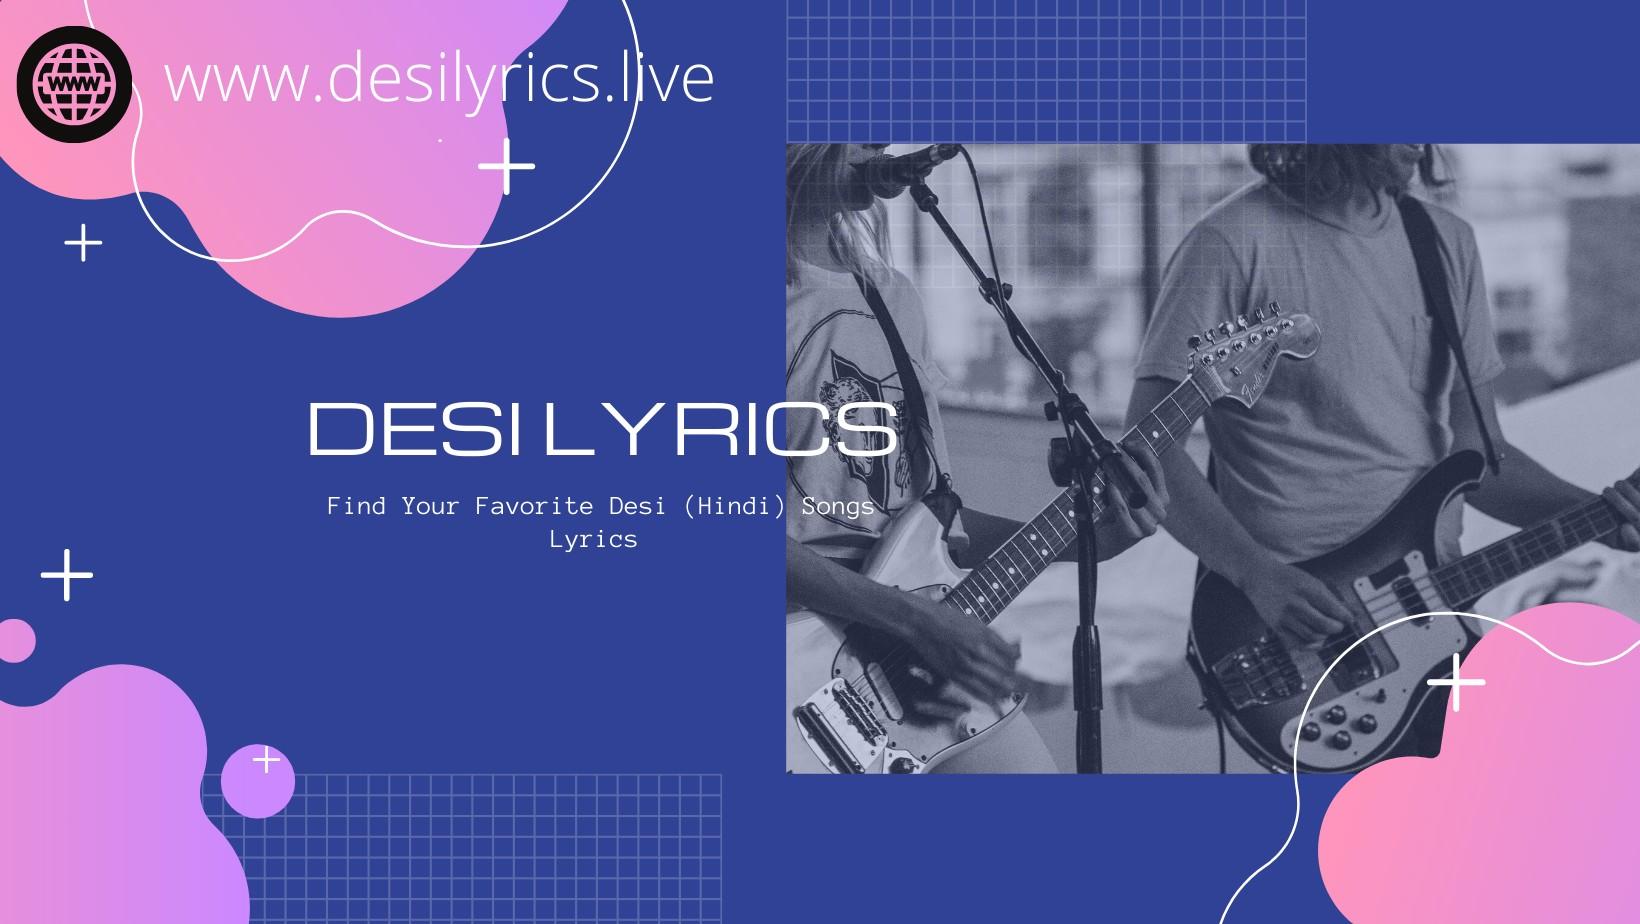 Find Your Favorite Desi (Hindi) Songs Lyrics | Desilyrics